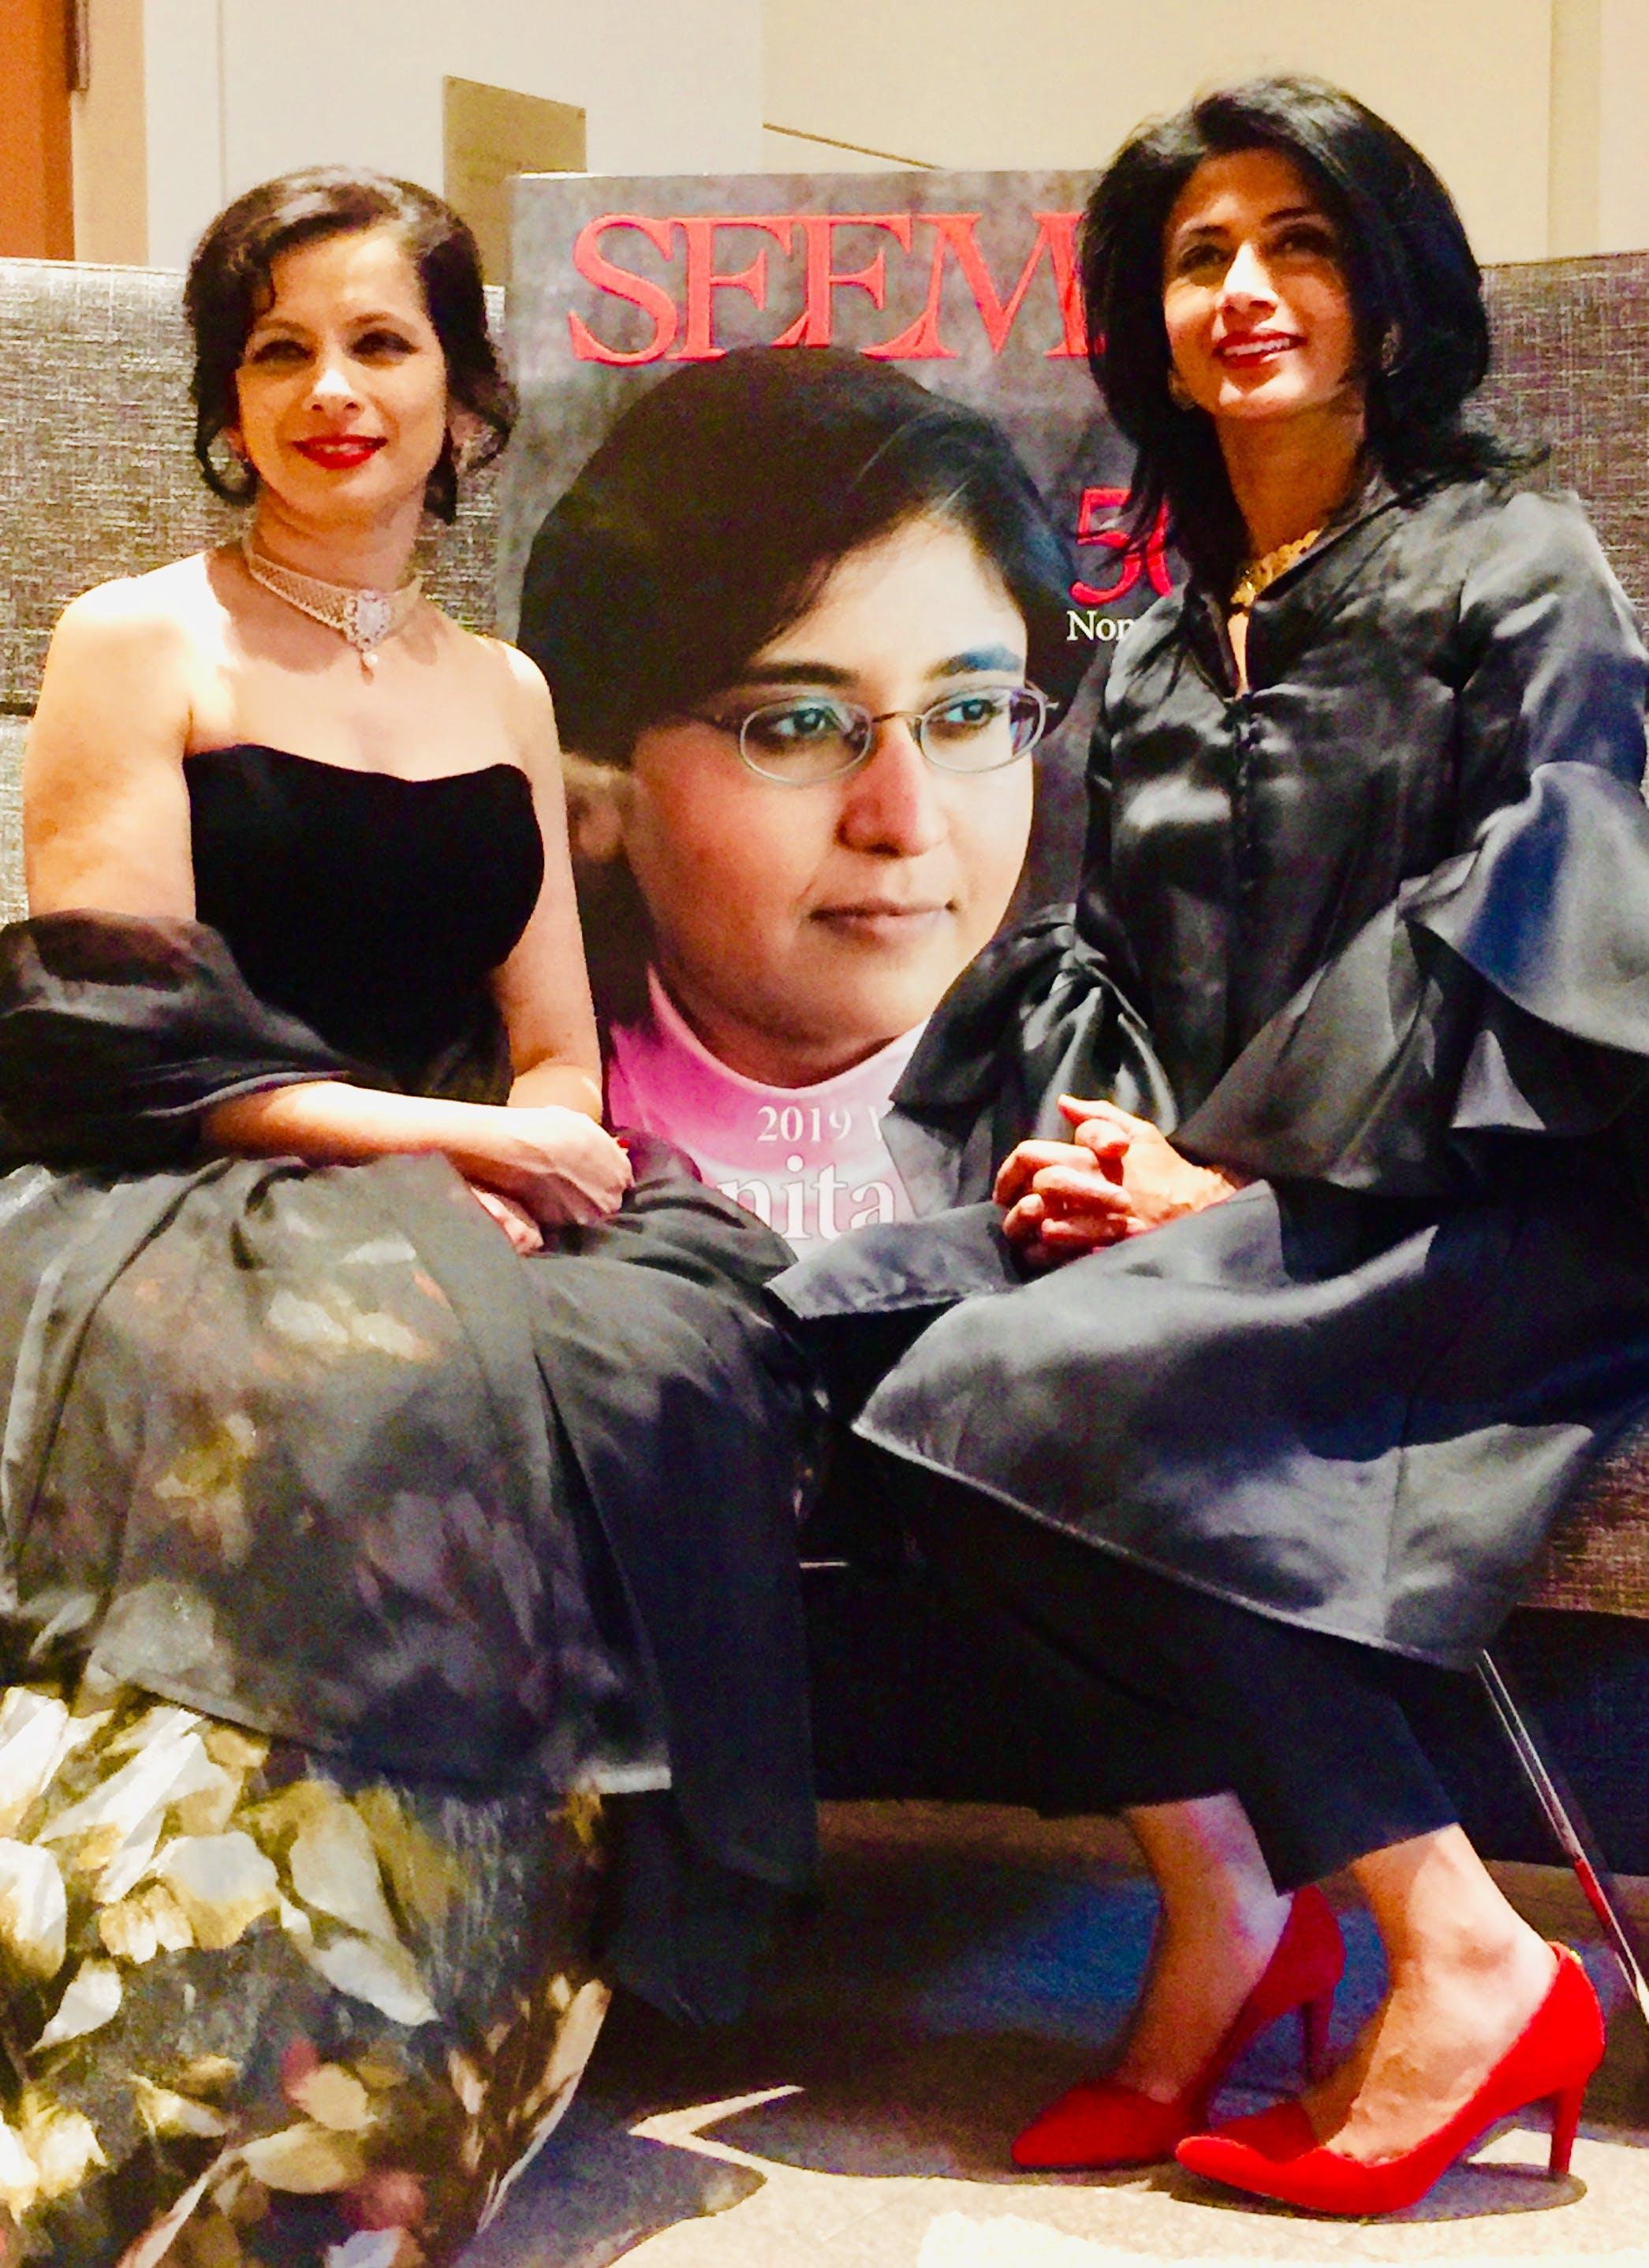 Seema Kumar and Nilanjana Bhowmik for SEEMA Woman Entrepreneur of the Year award. SEEMA Magazine. SEEMA entrepreneurs. Boston TiE. SEEMA Network. SEEMA empowering Indian women leaders. SEEMA 2019